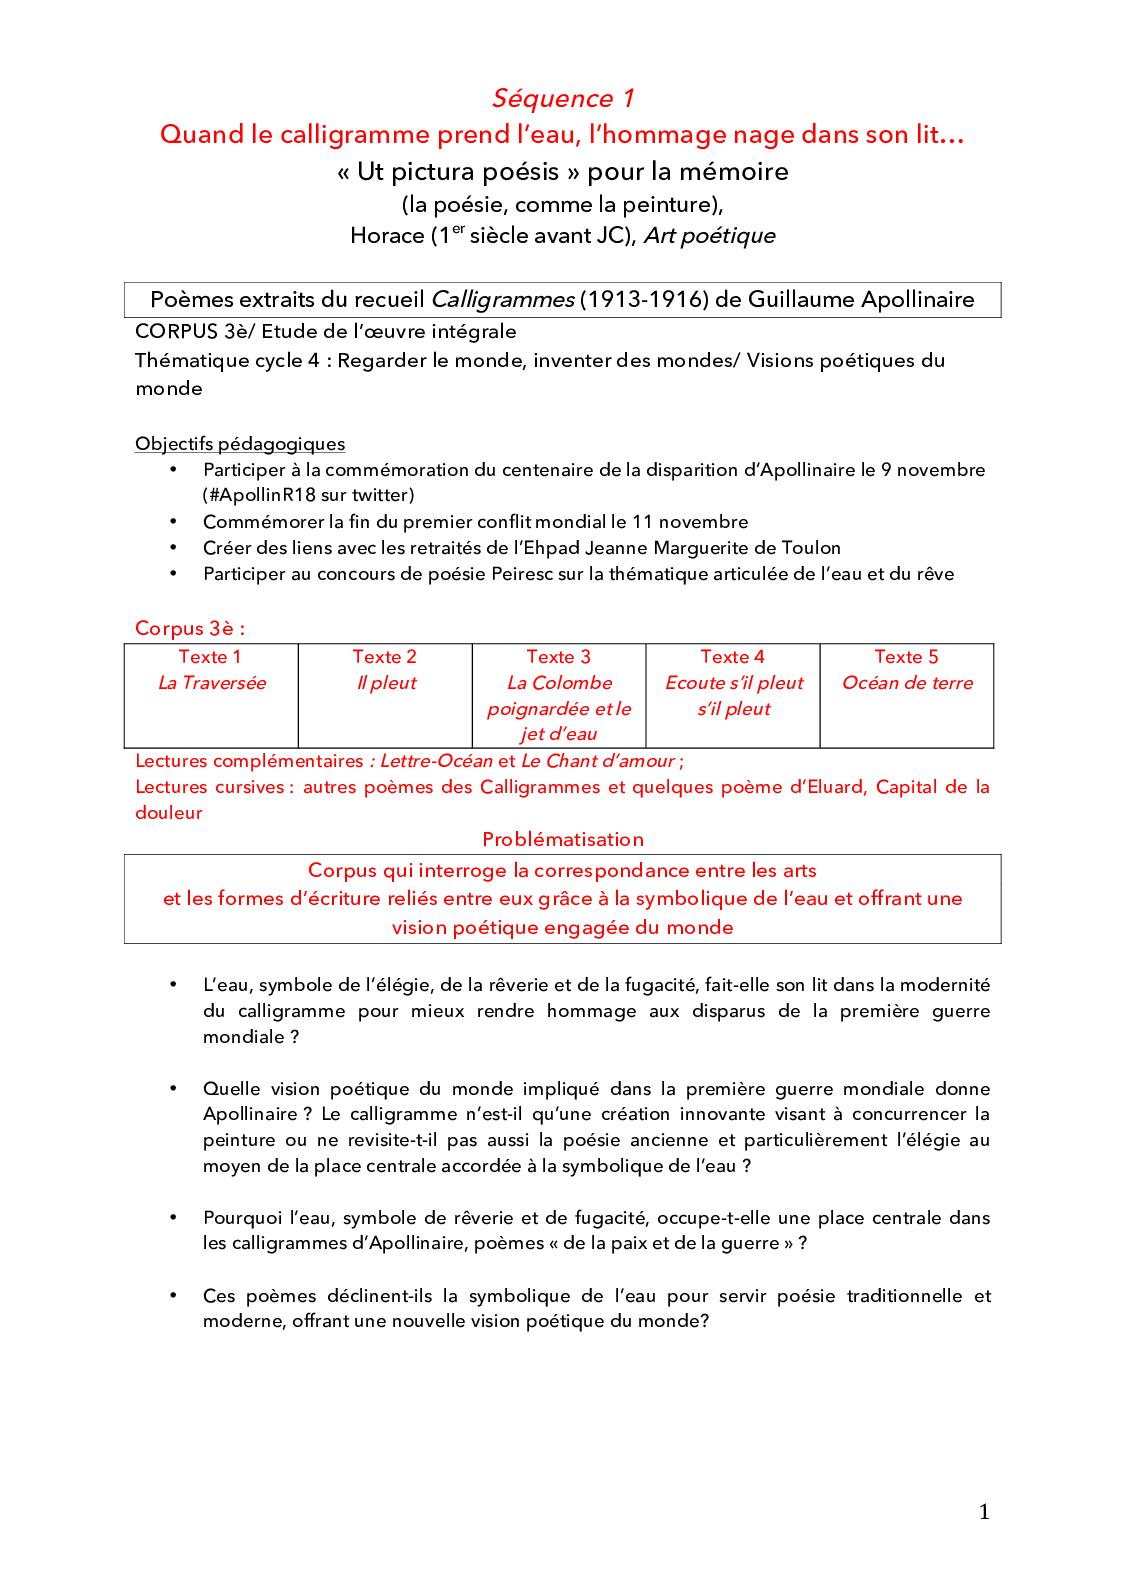 Calaméo Sequence Denseignement Sur Apollinaire